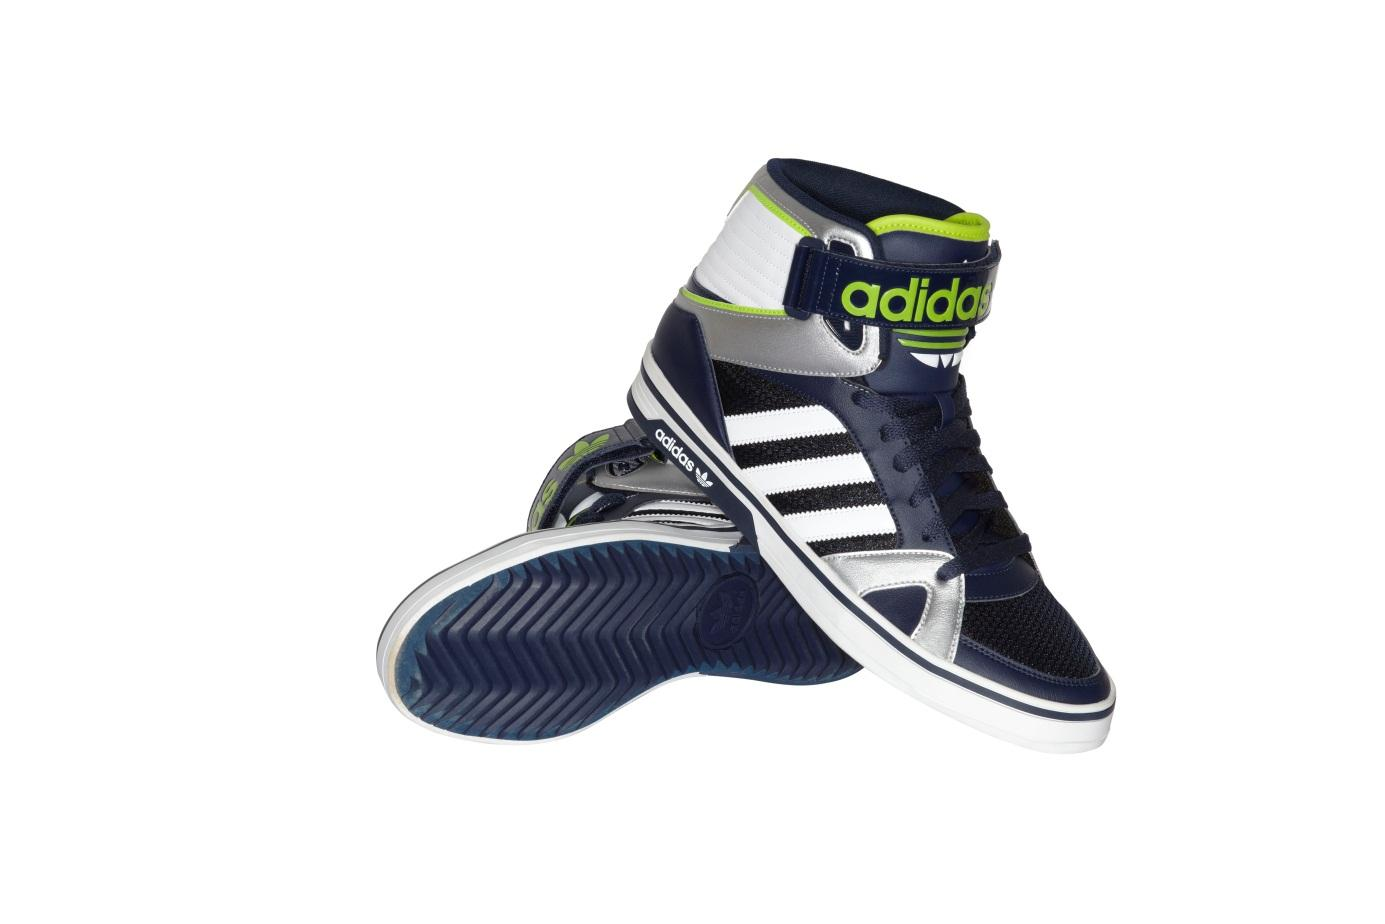 E Diver DoggSpace Adidas Locker SponsorizzatoSnoop Foot Video By 0Oy8wmNvn